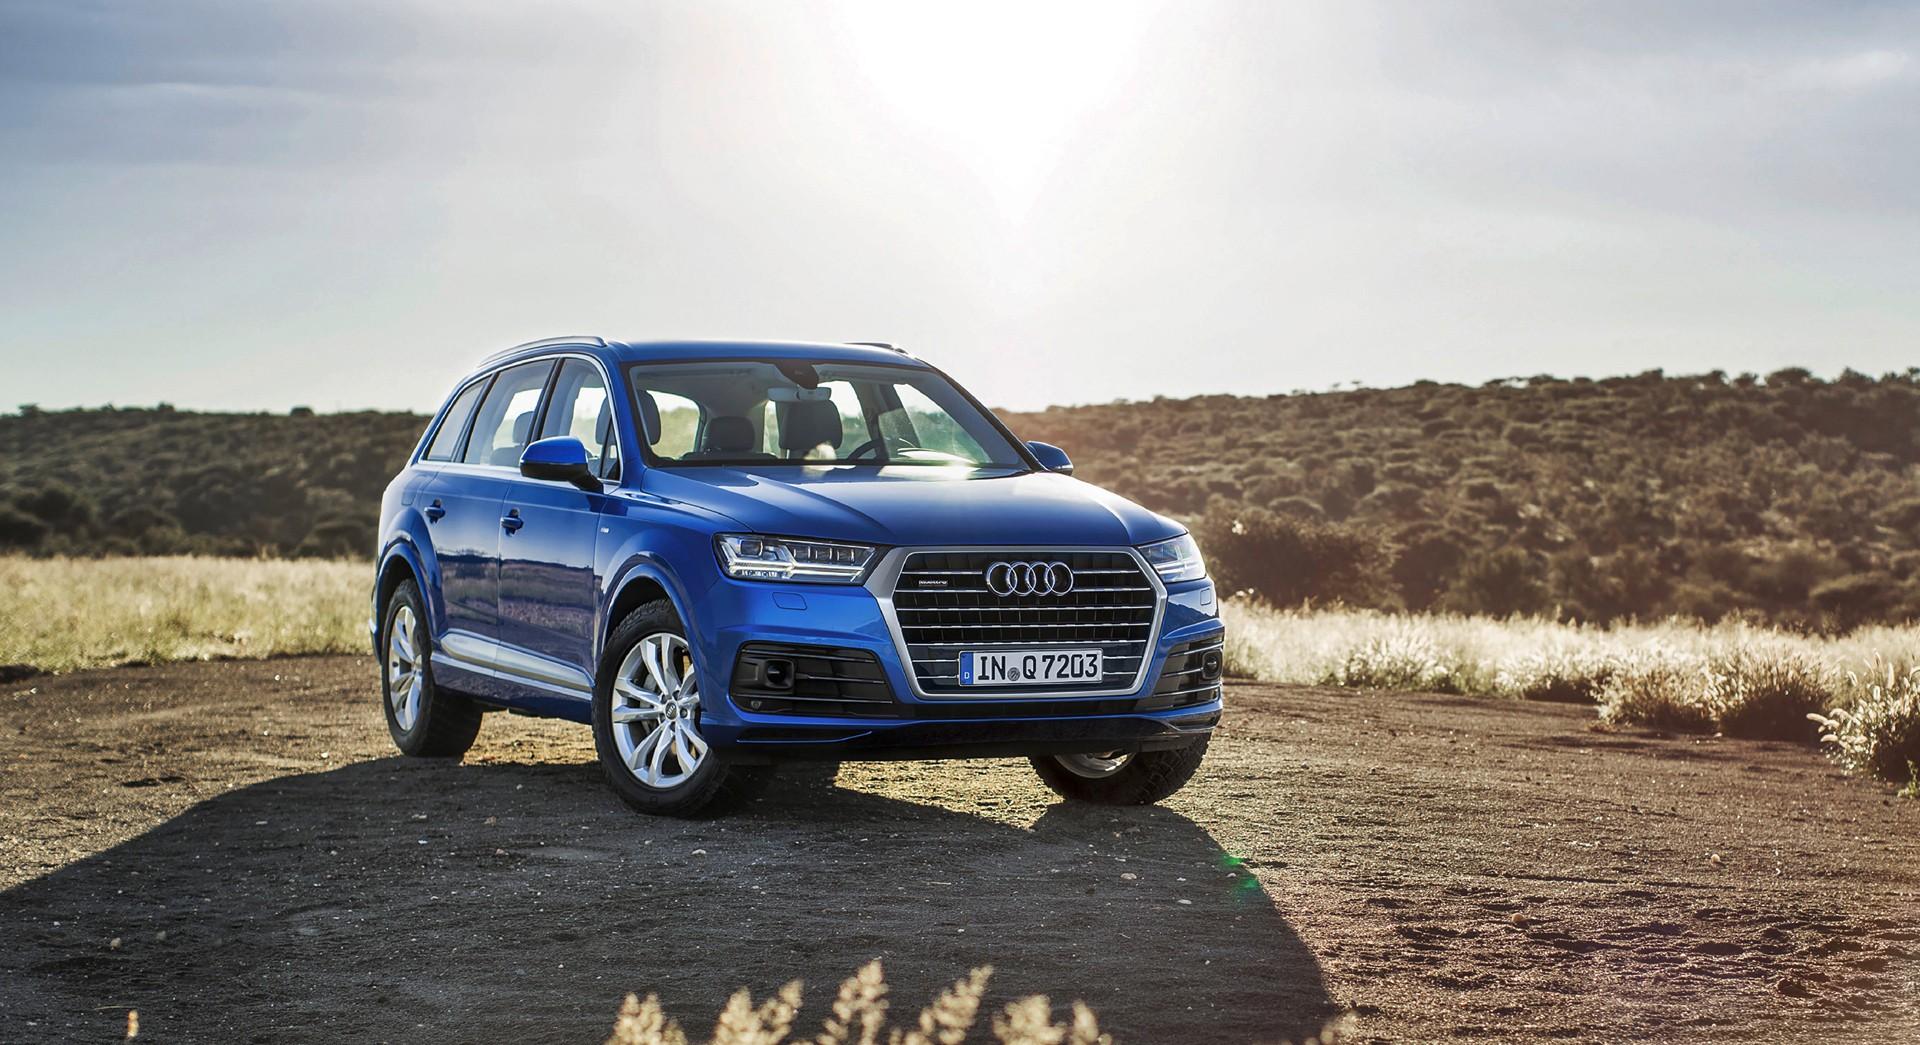 Audi Q7 Blue Front - HD Desktop Wallpapers